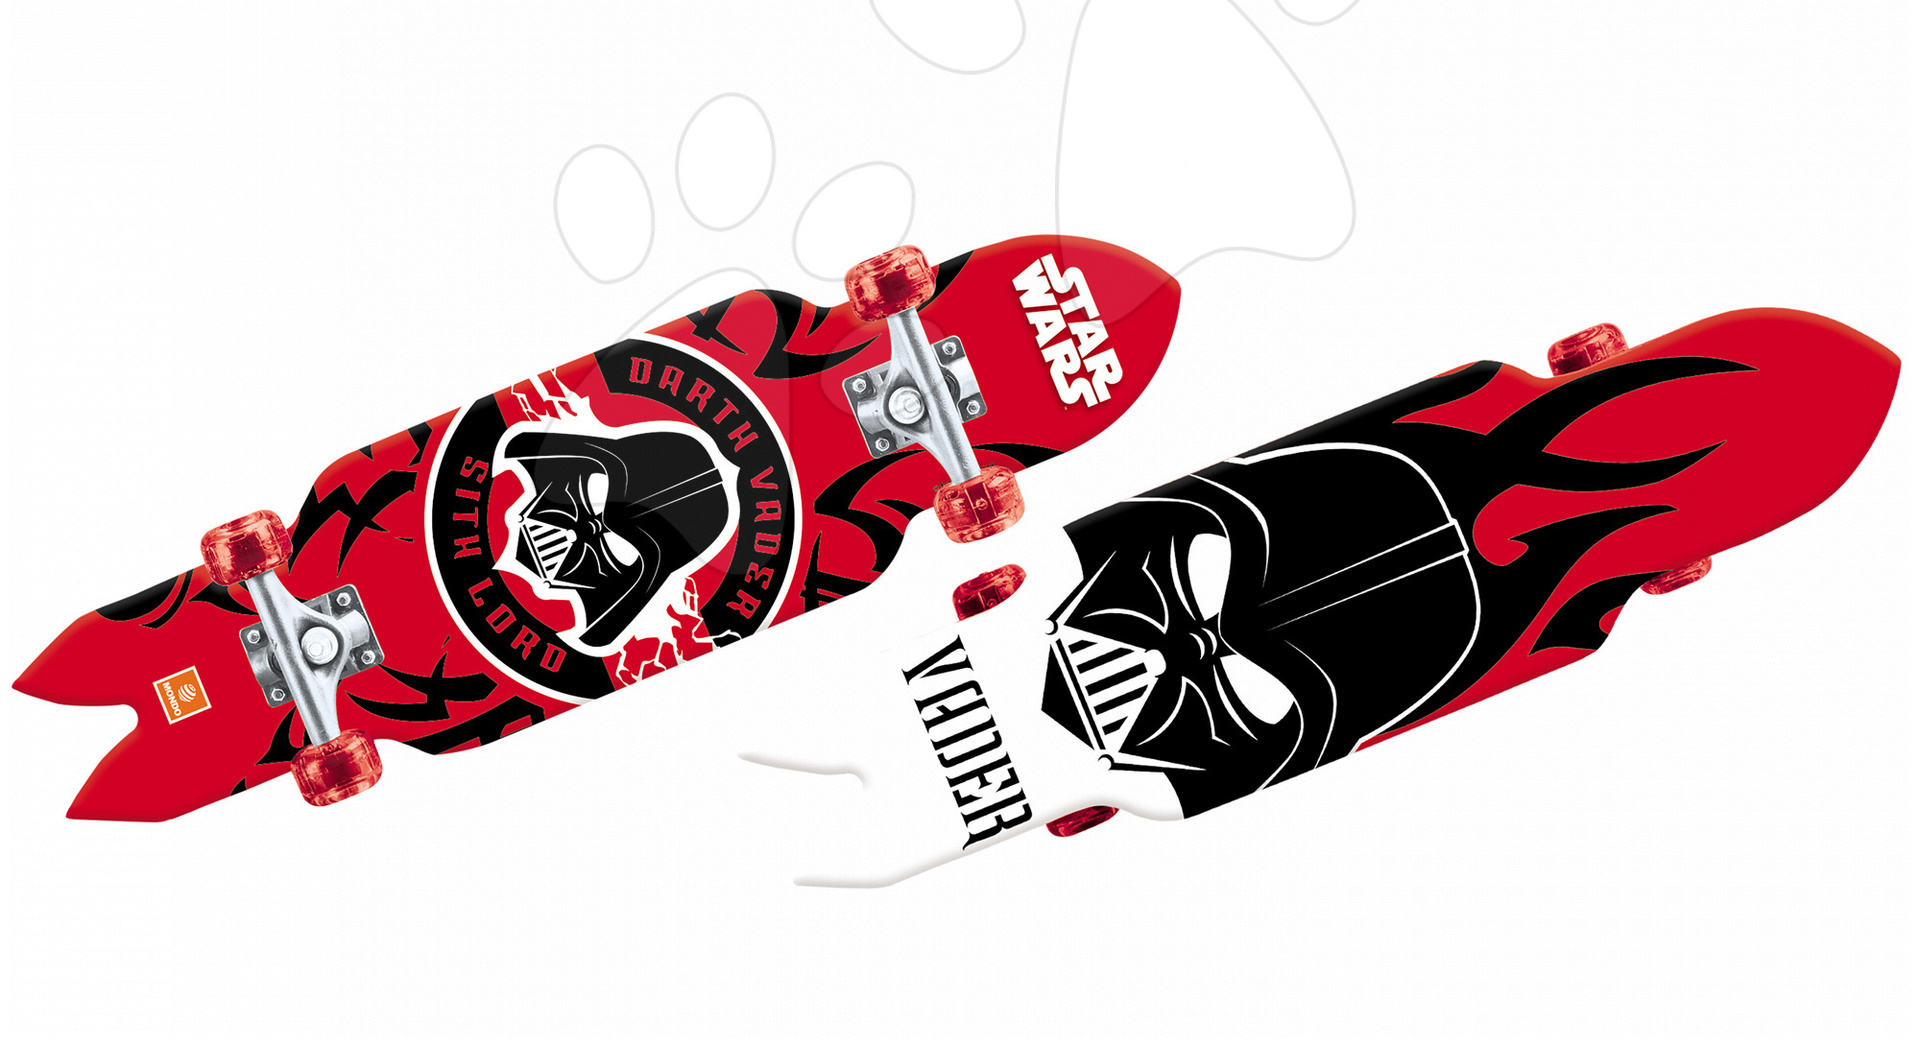 Detské skateboardy - Skateboard Star Wars Shuttle Mondo svietiaci dĺžka 80 cm